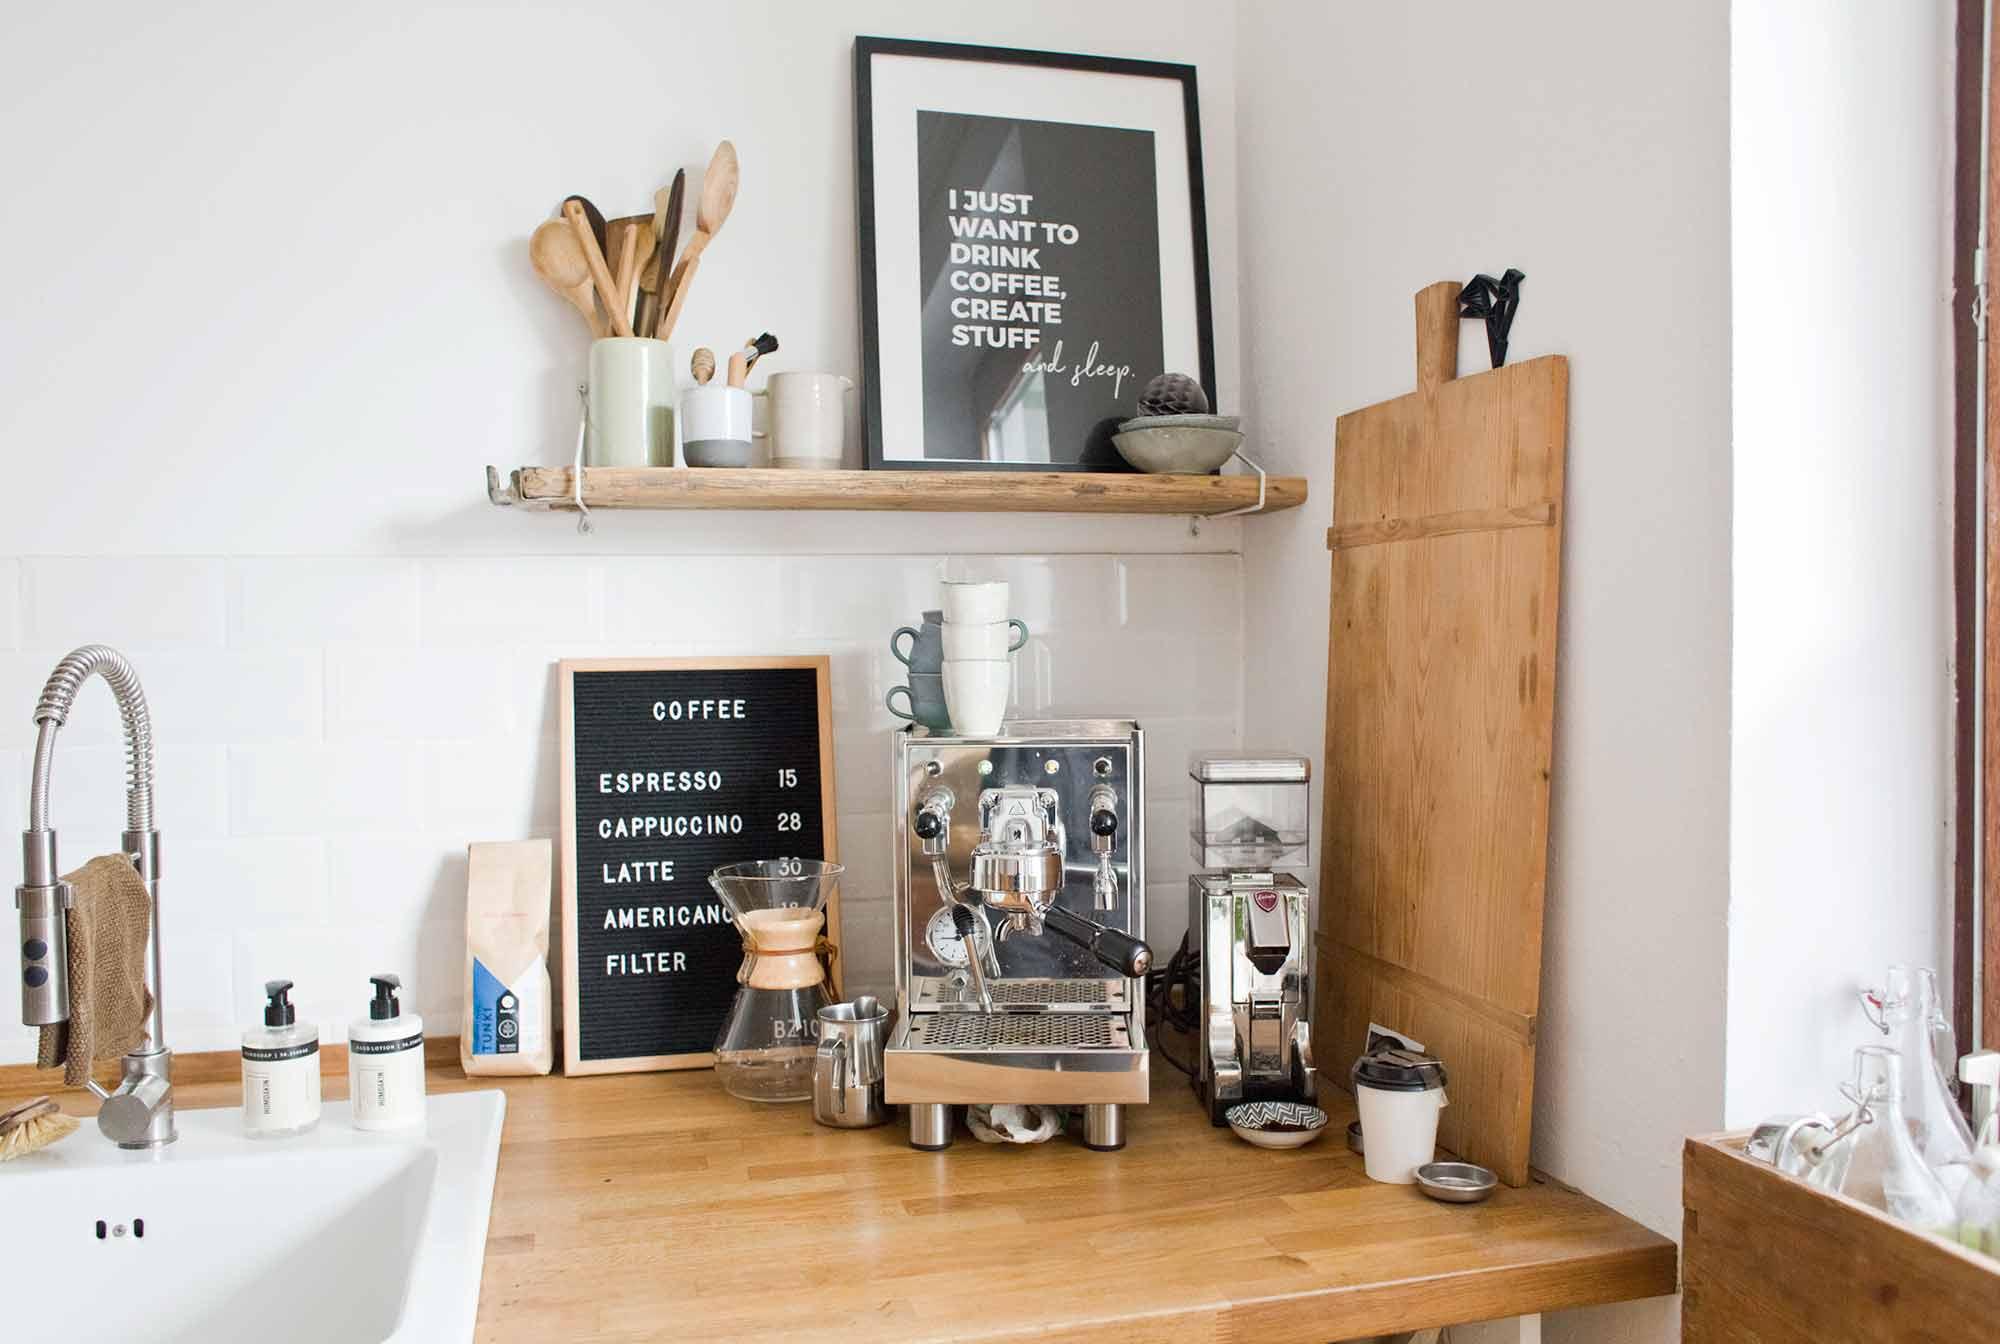 anne heijenga hat ihr traumhaus selbst renoviert femtastics. Black Bedroom Furniture Sets. Home Design Ideas